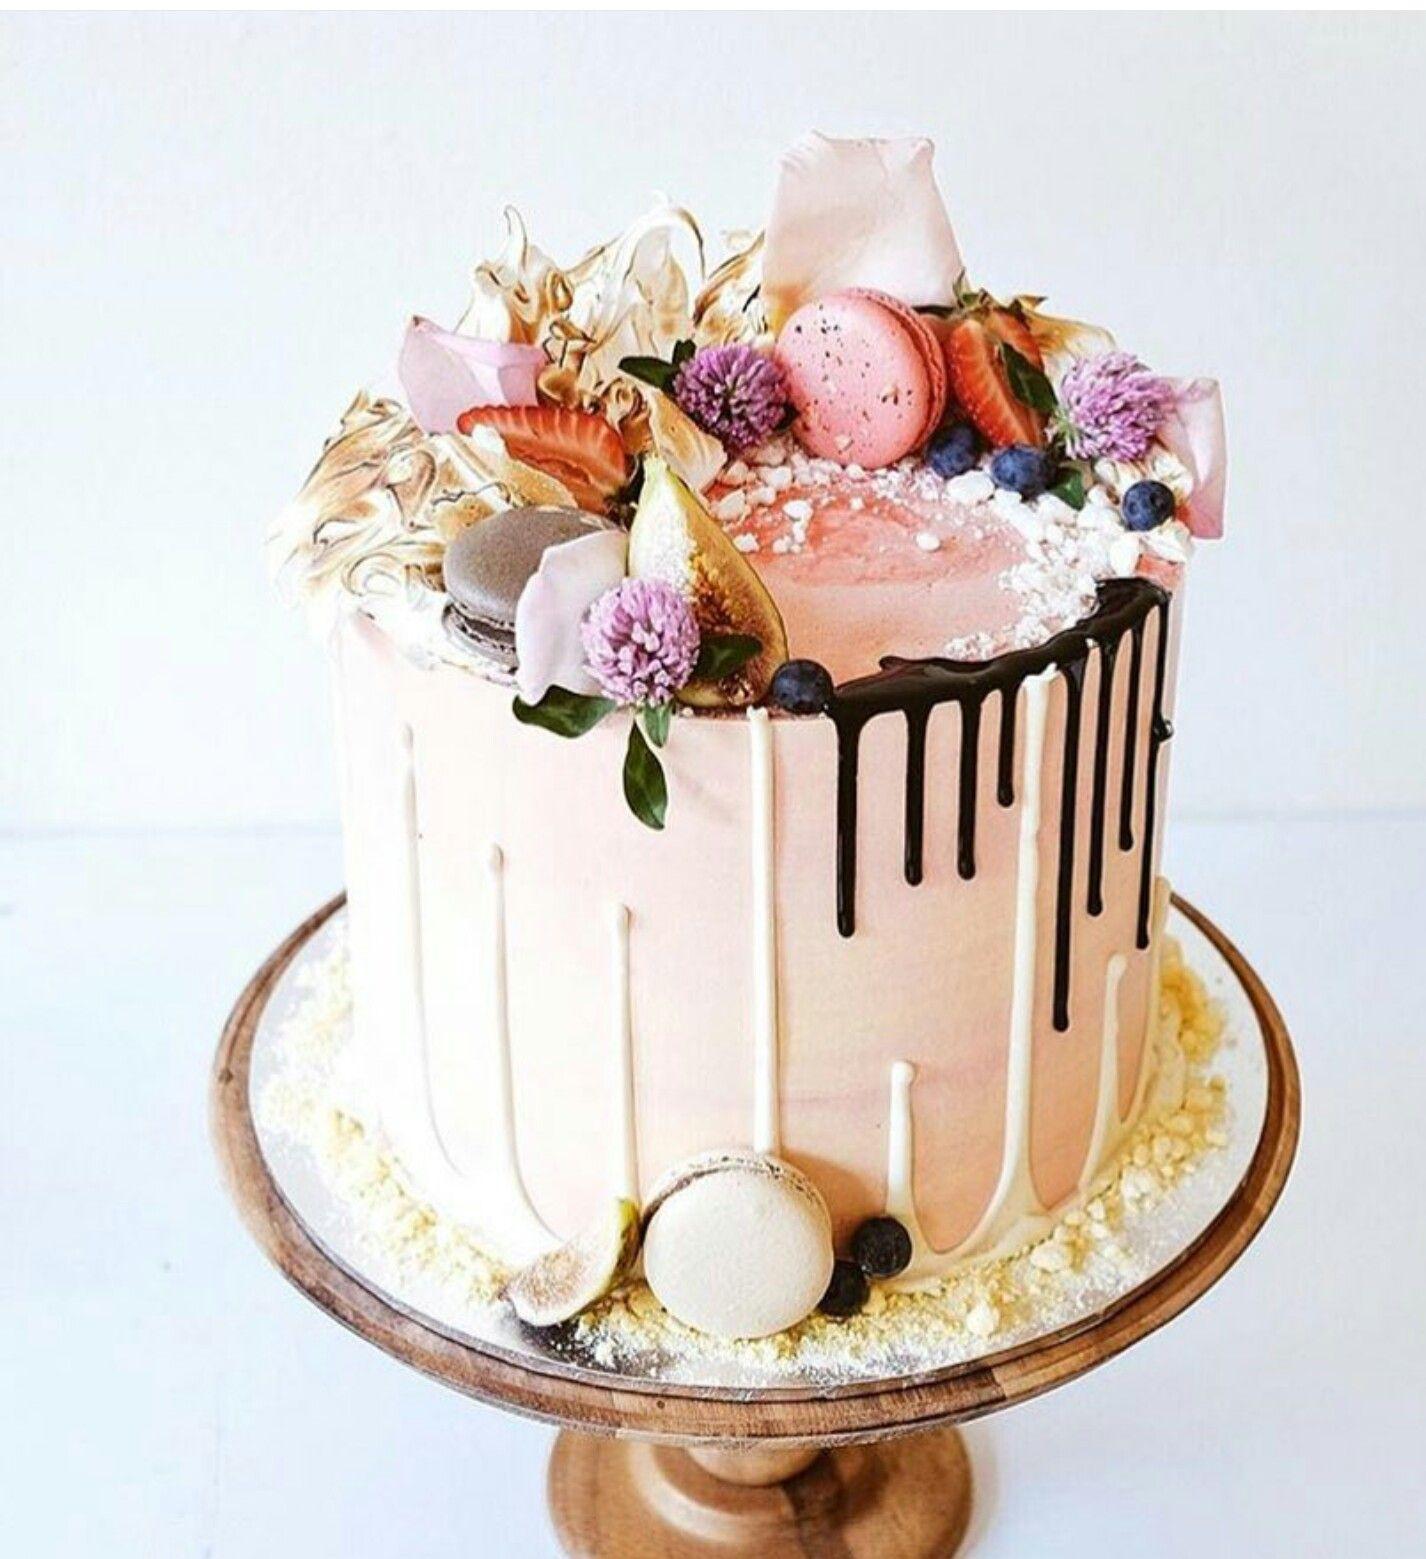 Kreative Hochzeitstorten, Kreativen Kuchen, Kuchen Dekorieren Tipps,  Schokolade Tropf Kuchen, Weiße Schokolade, Amazing Cakes, Schöne Kuchen,  Kuchen ...